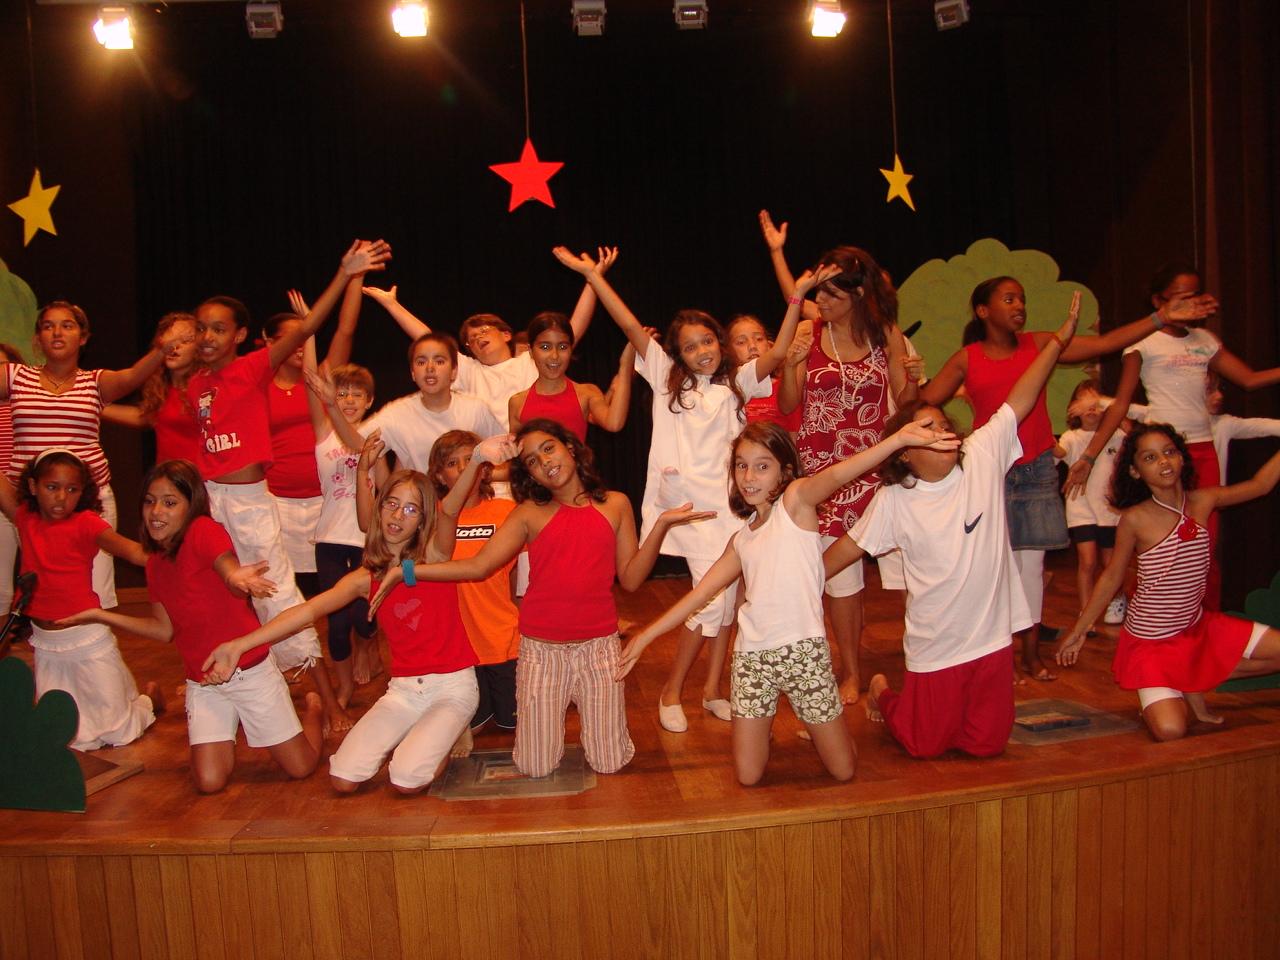 Feira de Natal 2007-2008